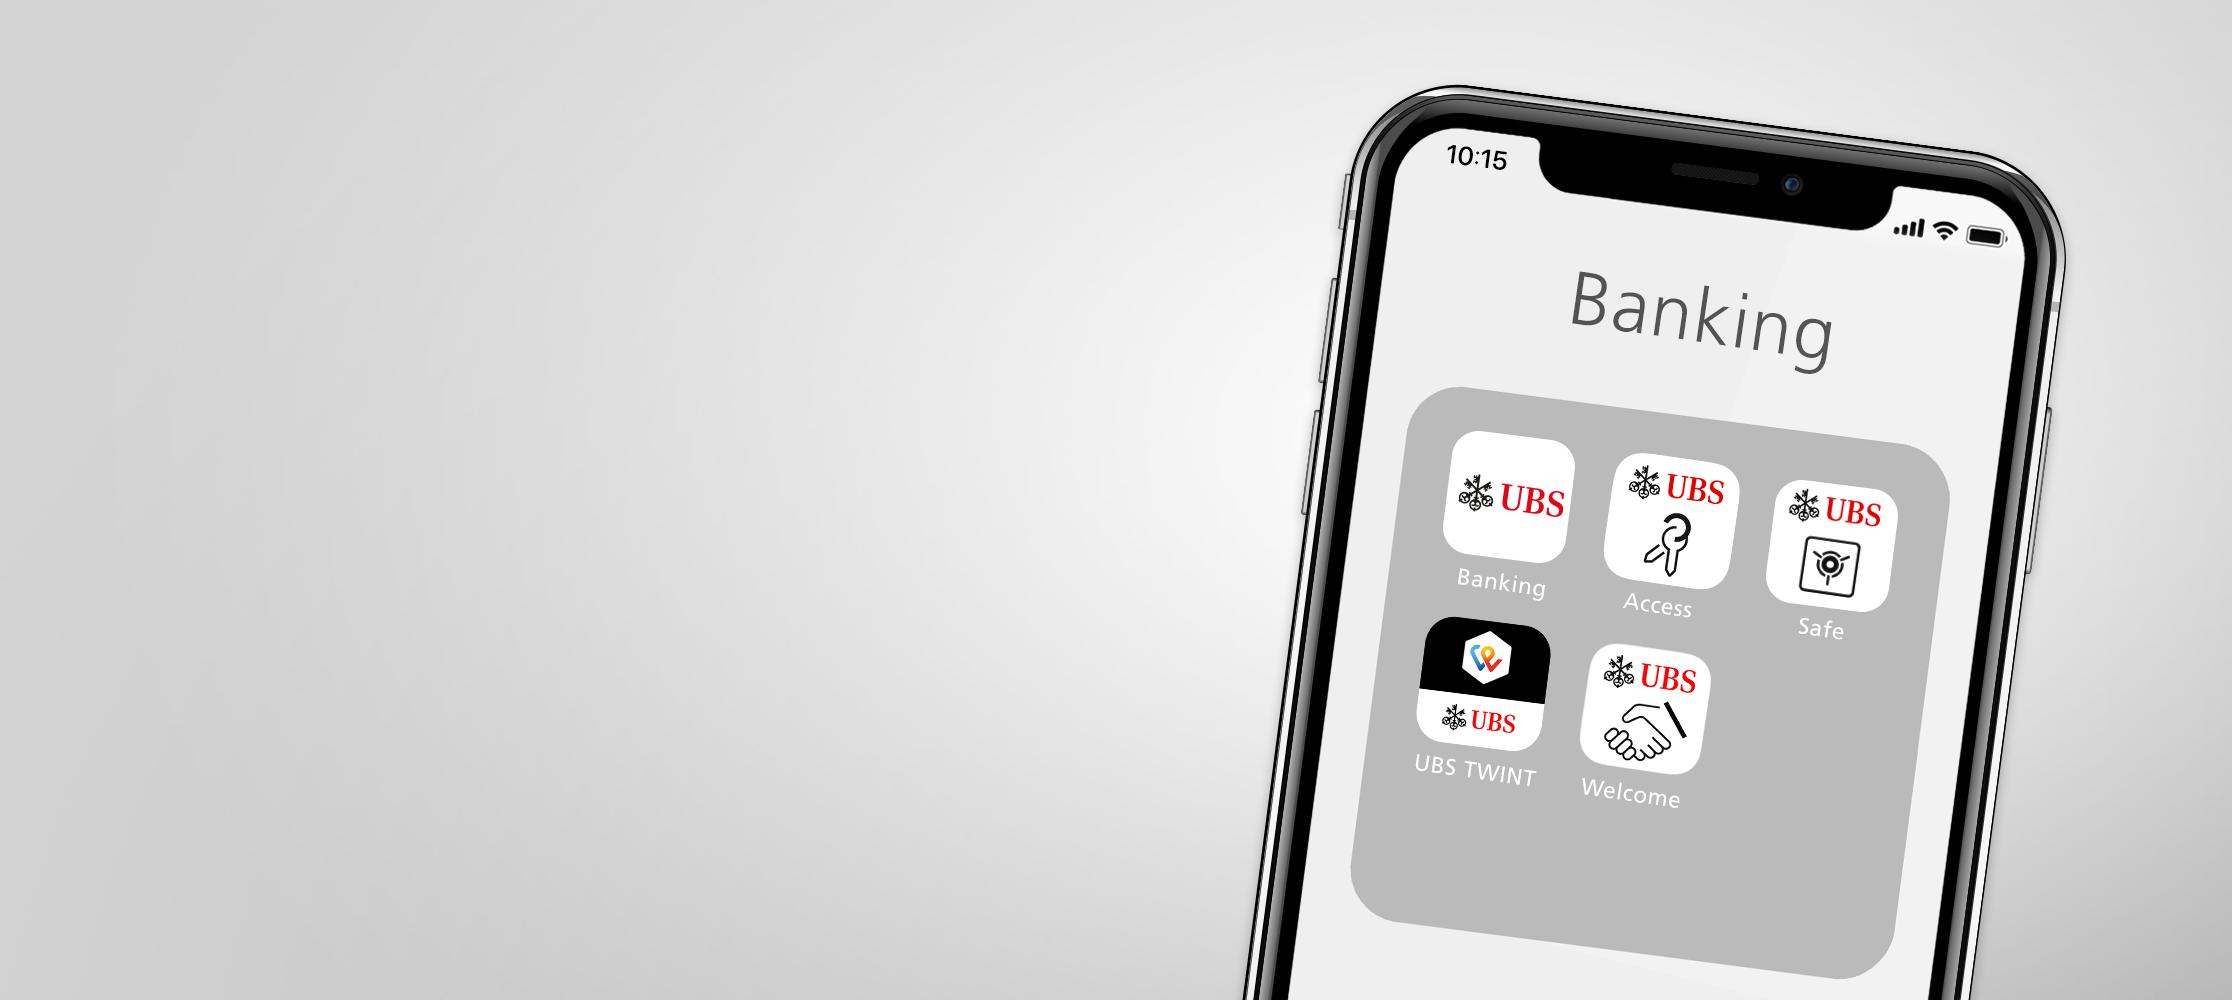 UBS Digital Banking apps | UBS Switzerland